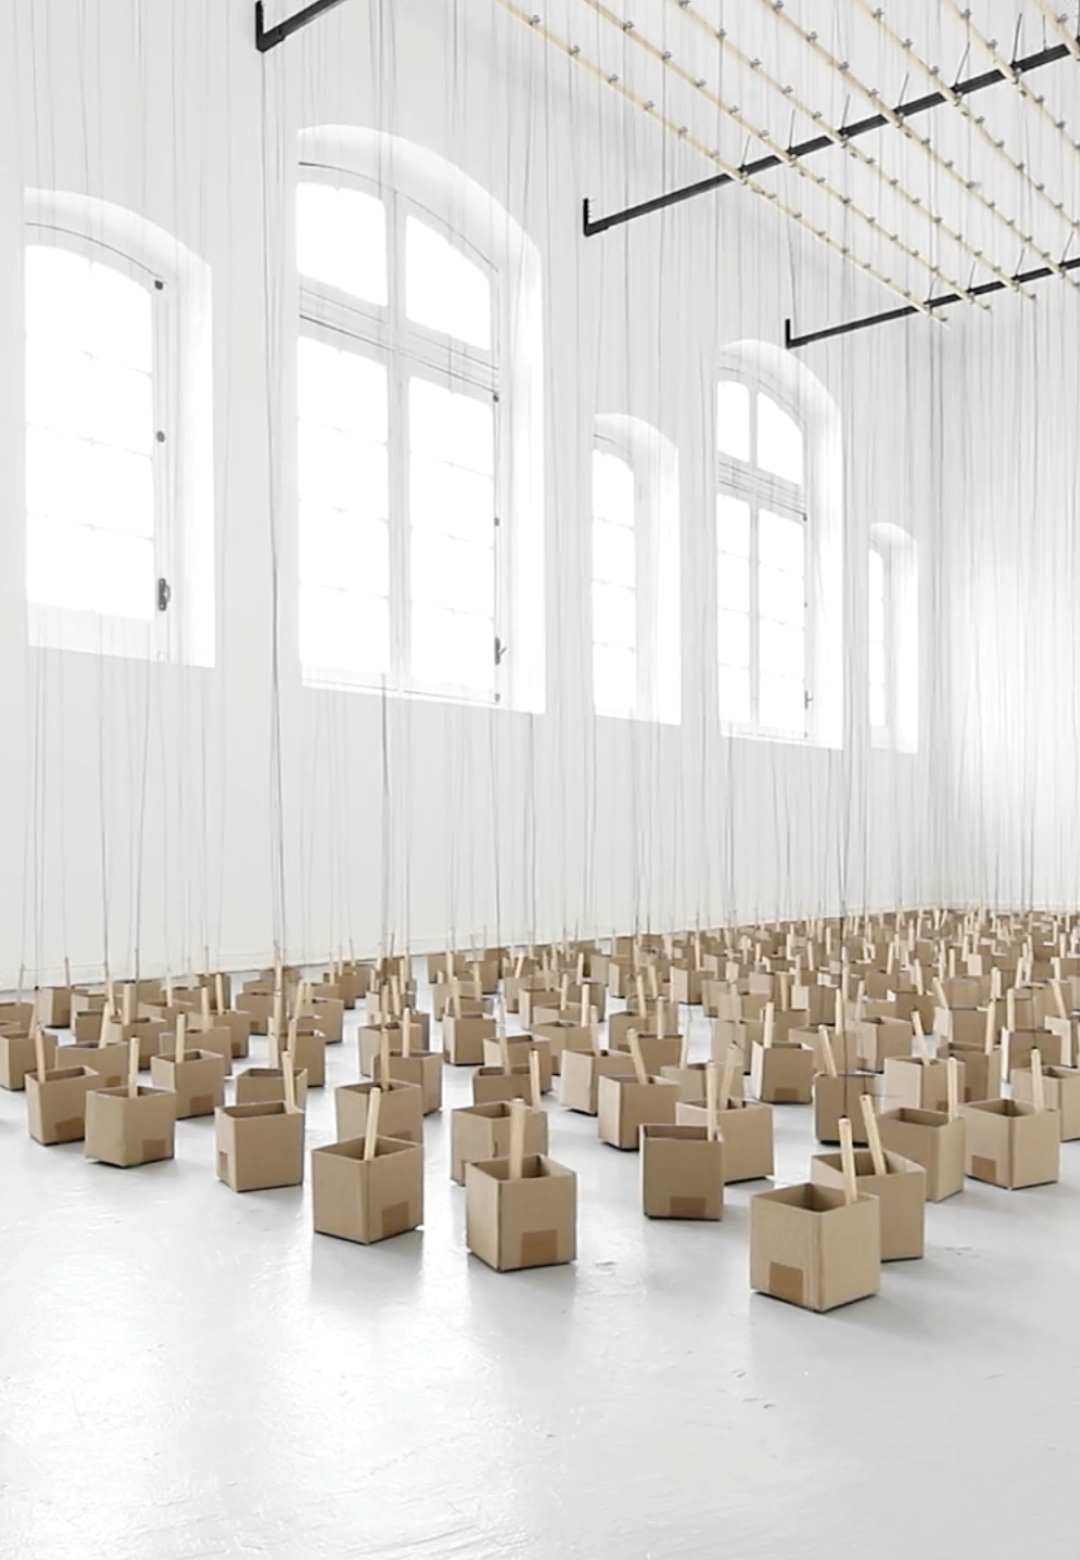 An installation by Zimoun, a Swiss artist   Studio Zimoun   STIRworld